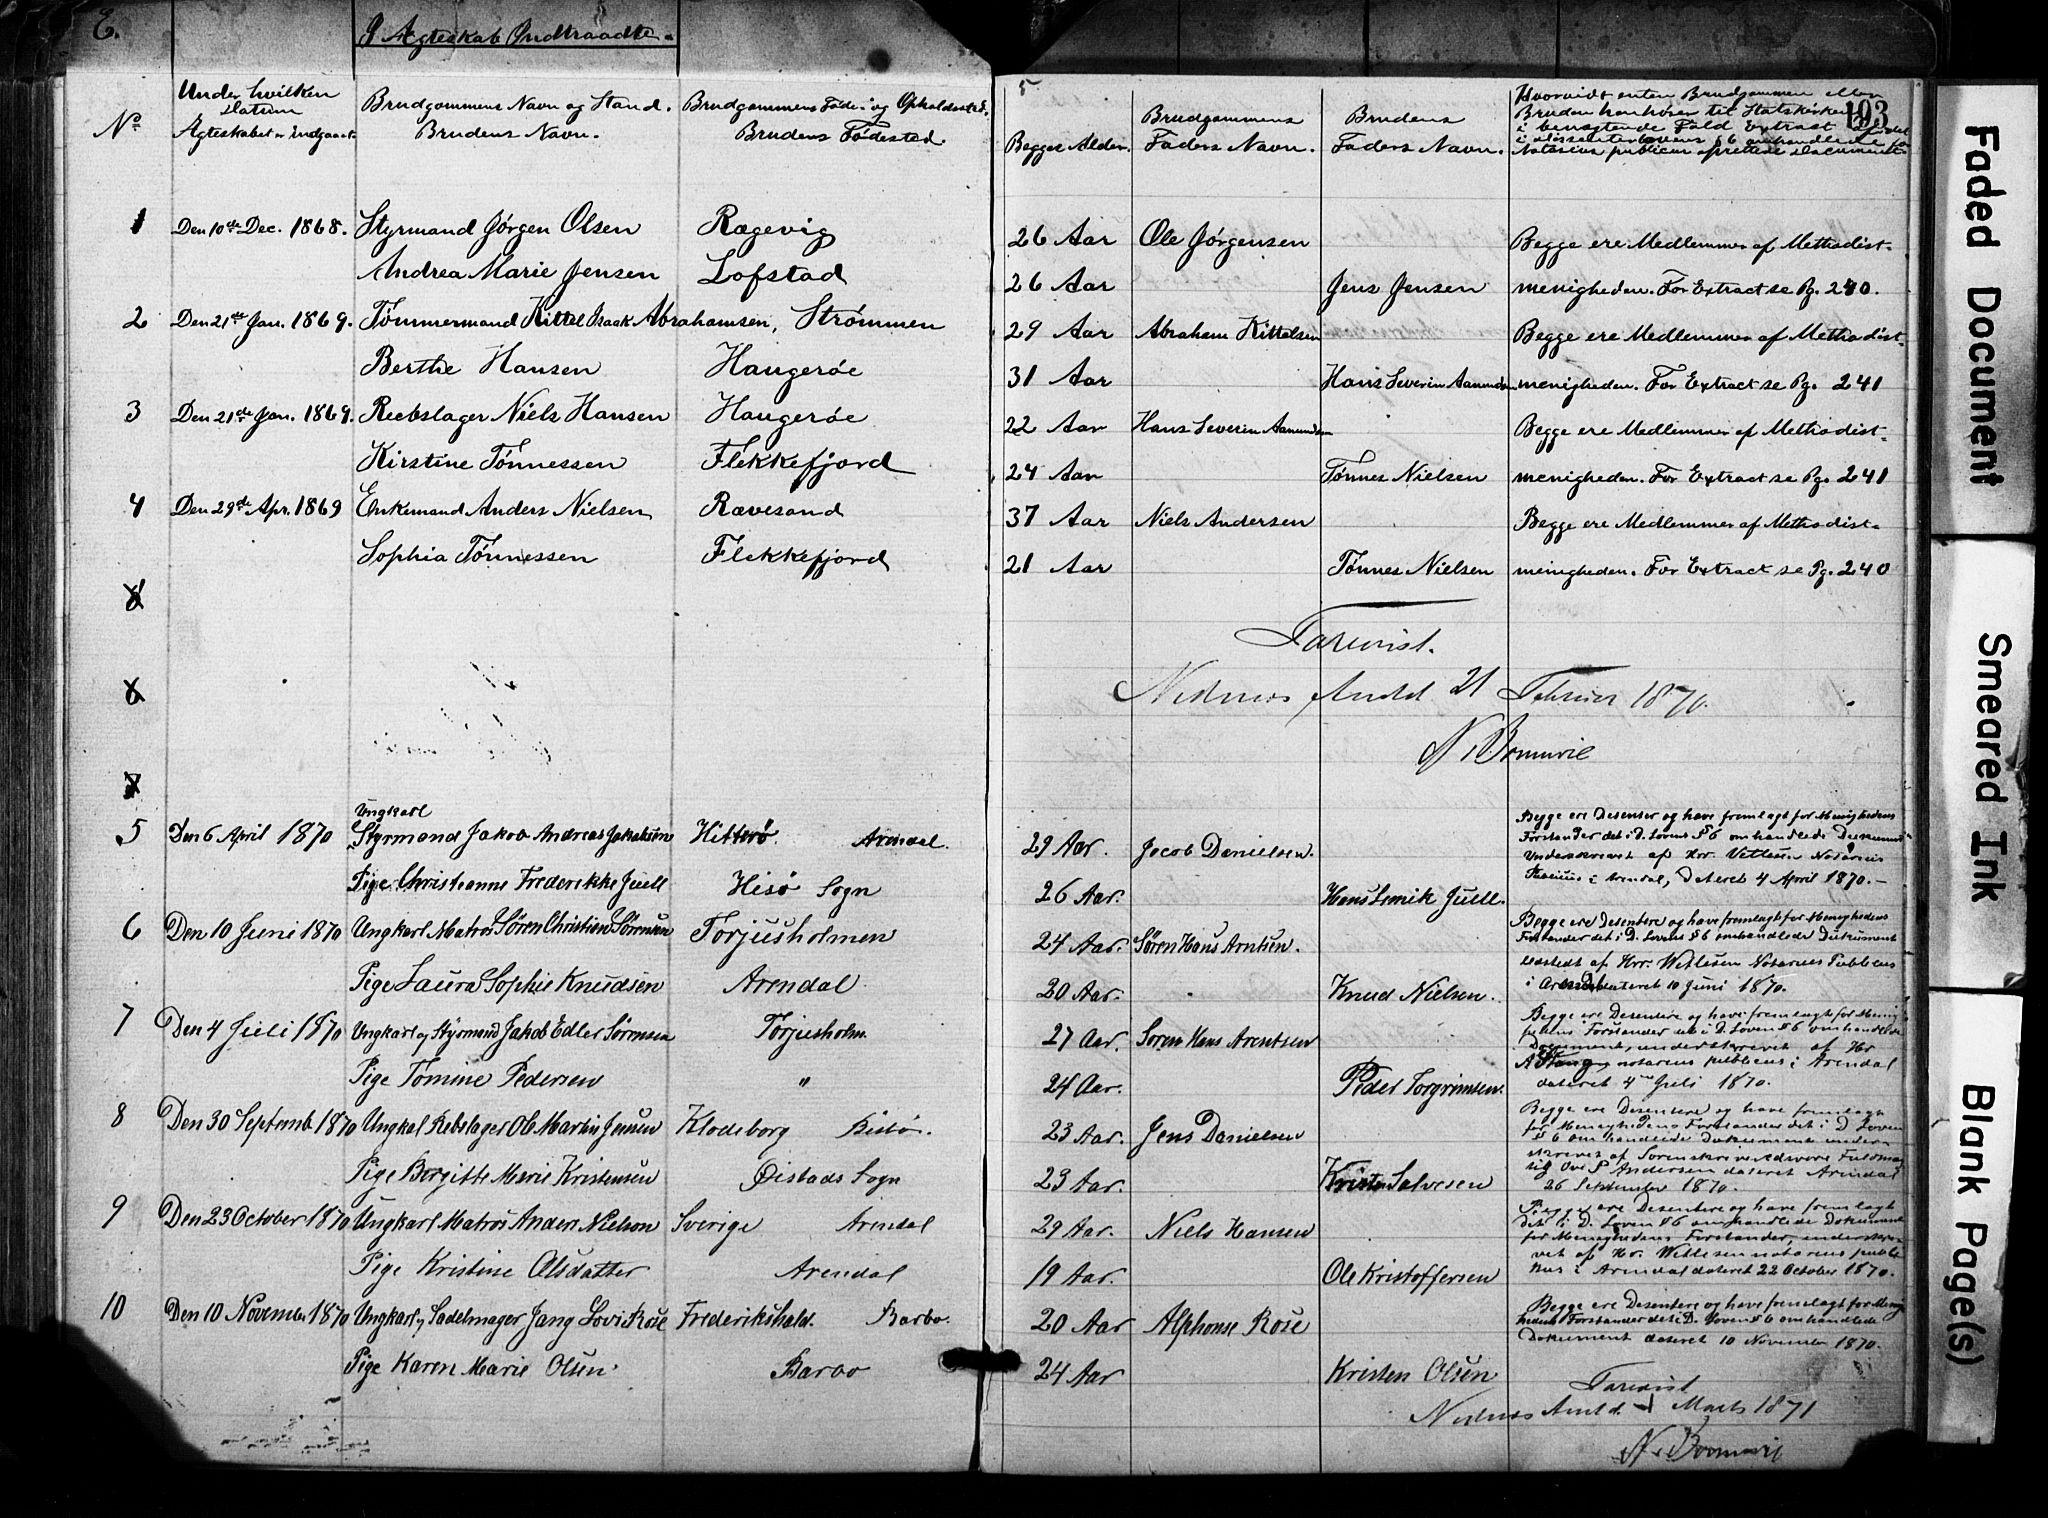 SAK, Metodistmenigheten, Arendal, F/Fa/L0001: Dissenterprotokoll nr. F-2, 1867-1879, s. 193